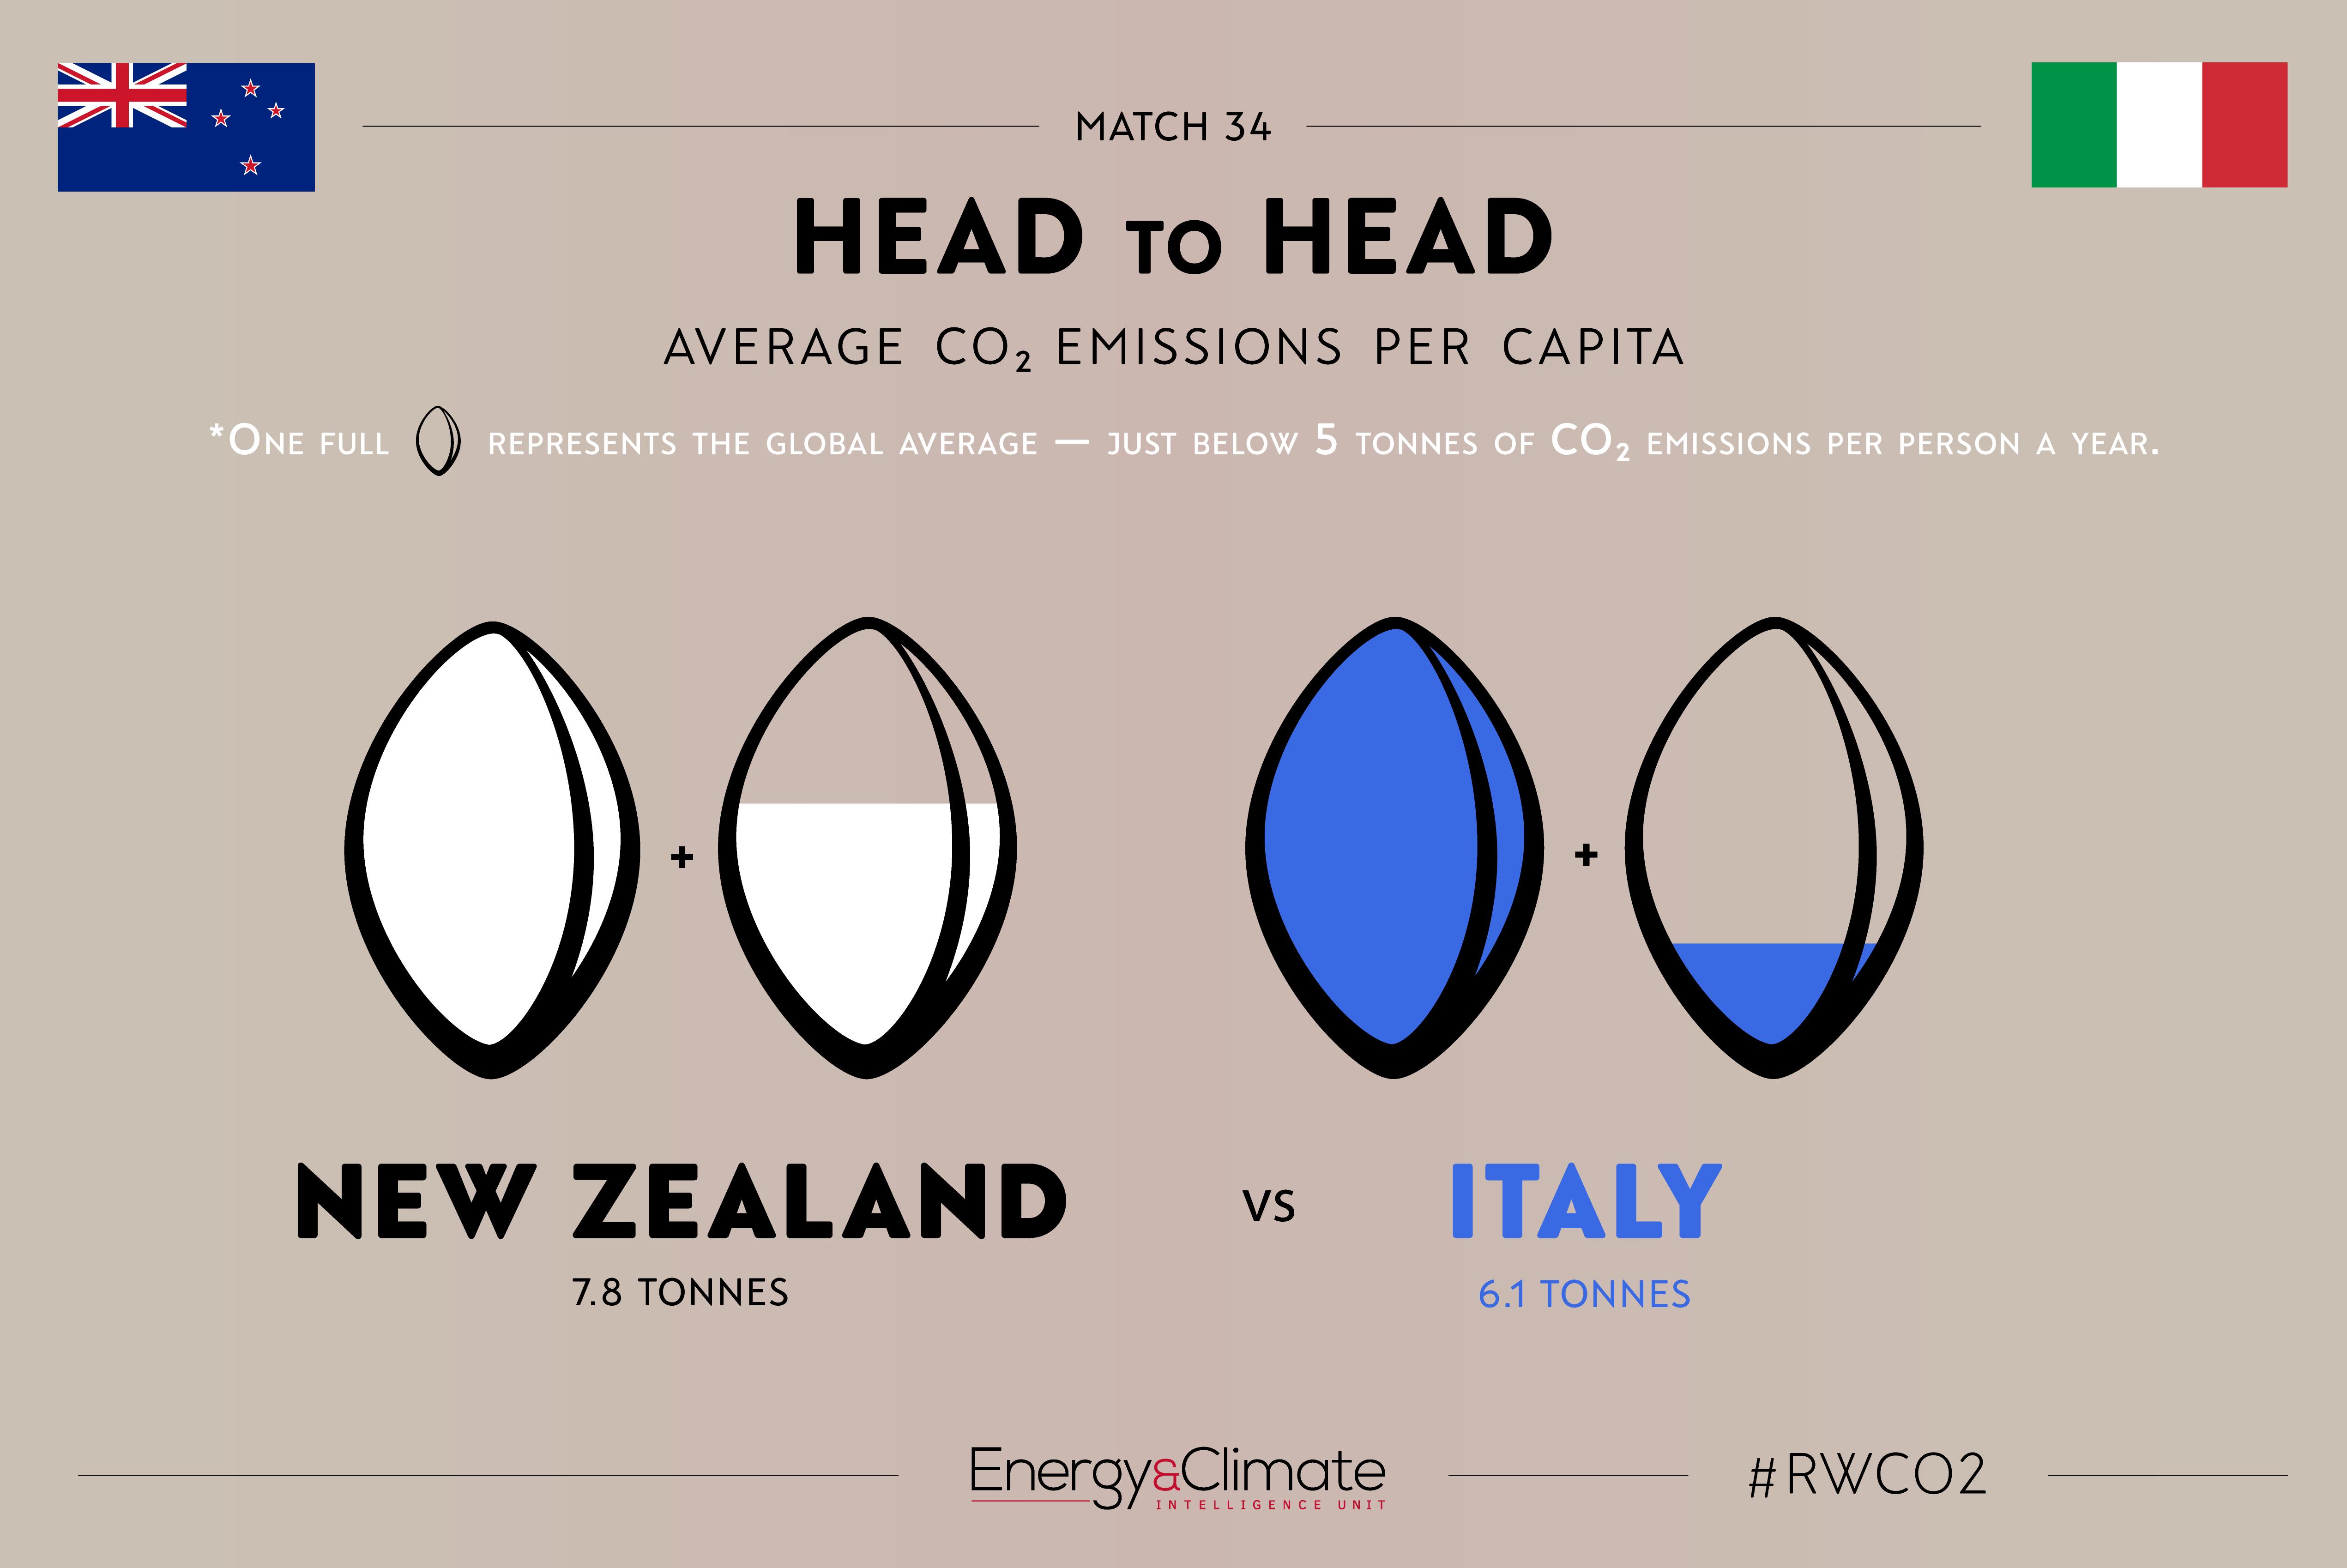 New Zealand v Italy - per capita emissions